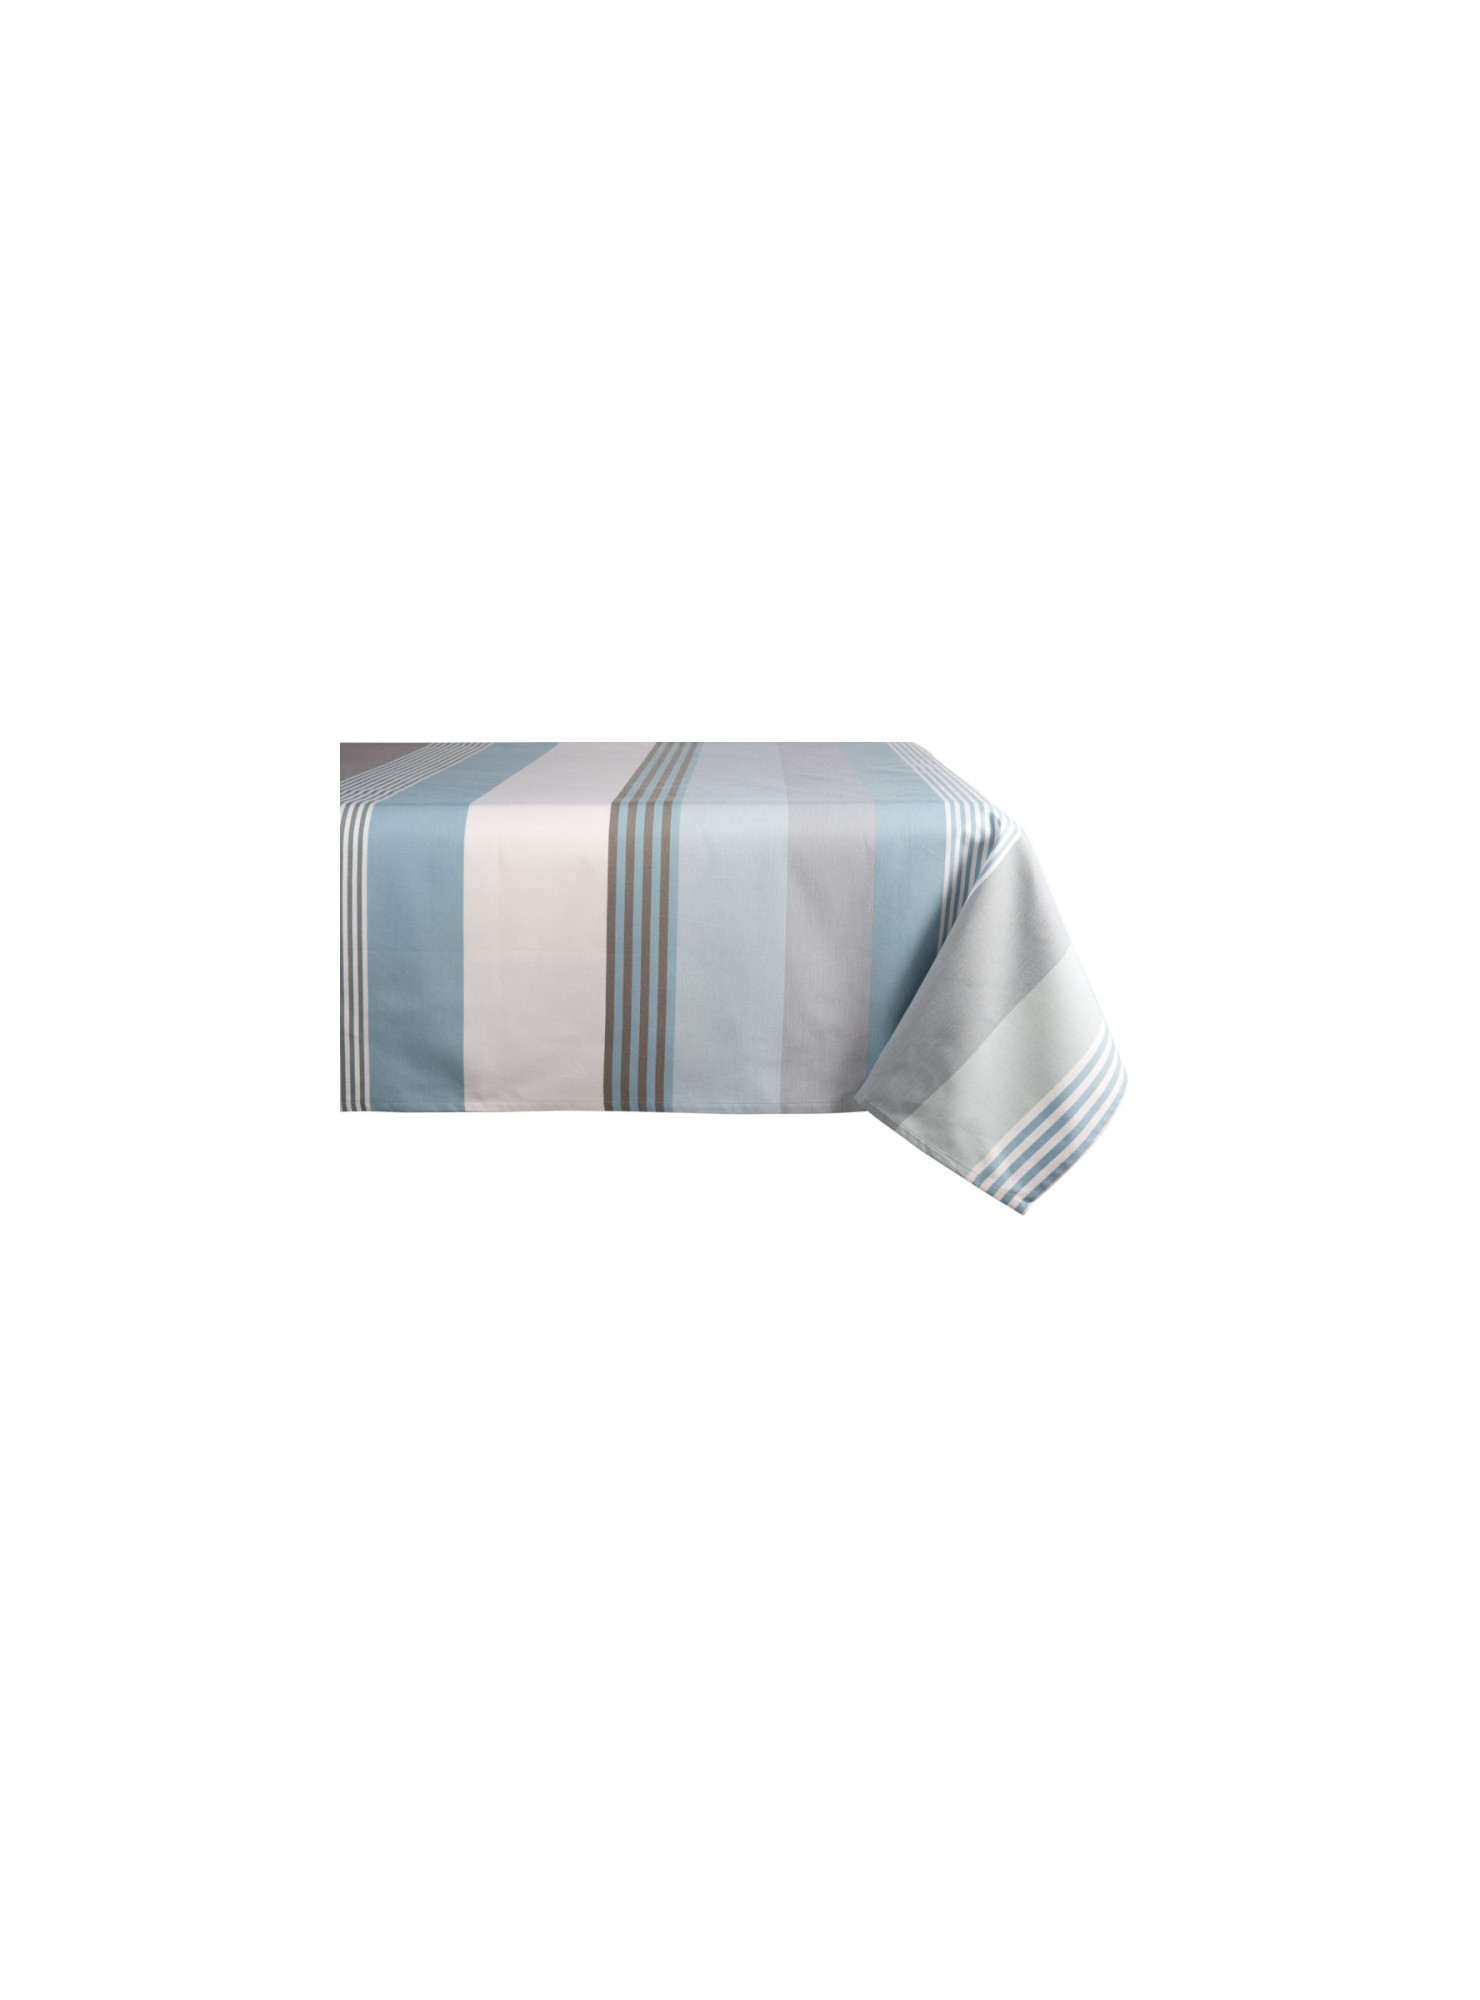 Coated tablecloth Belle-île en Mer tableware basque linen